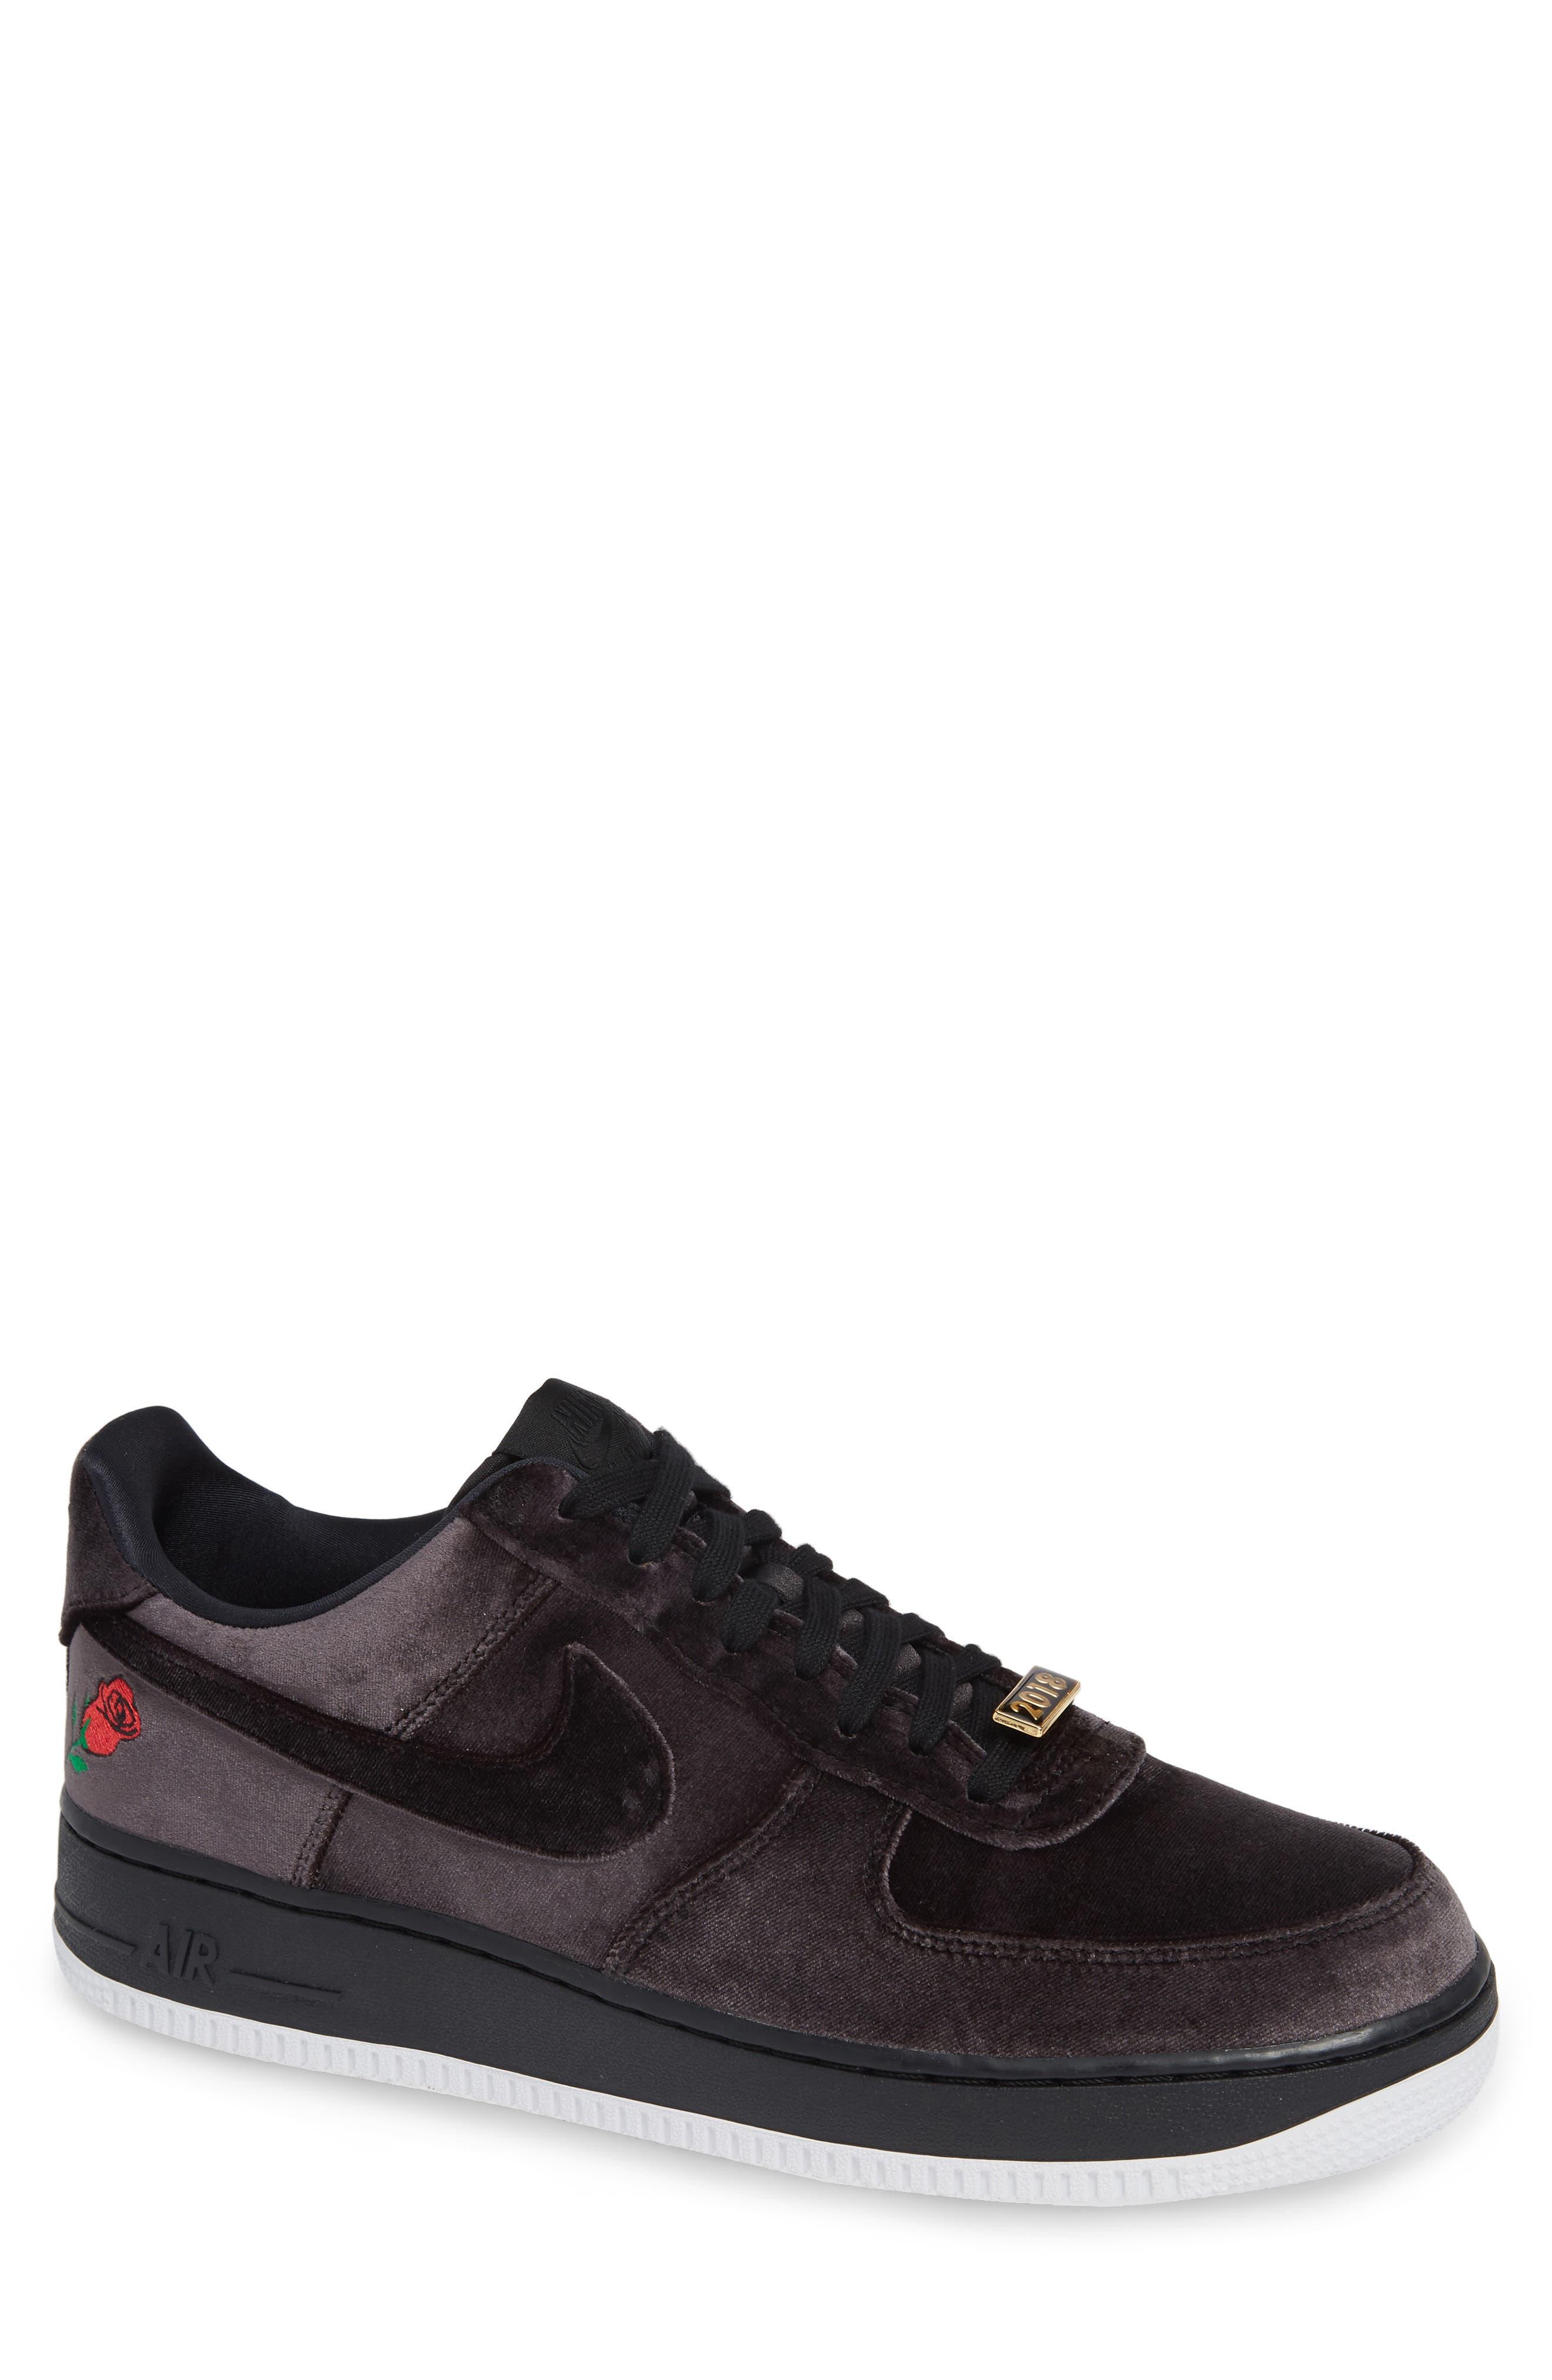 Air Force 1 '07 QS Sneaker,                         Main,                         color, BLACK/ BLACK/ WHITE